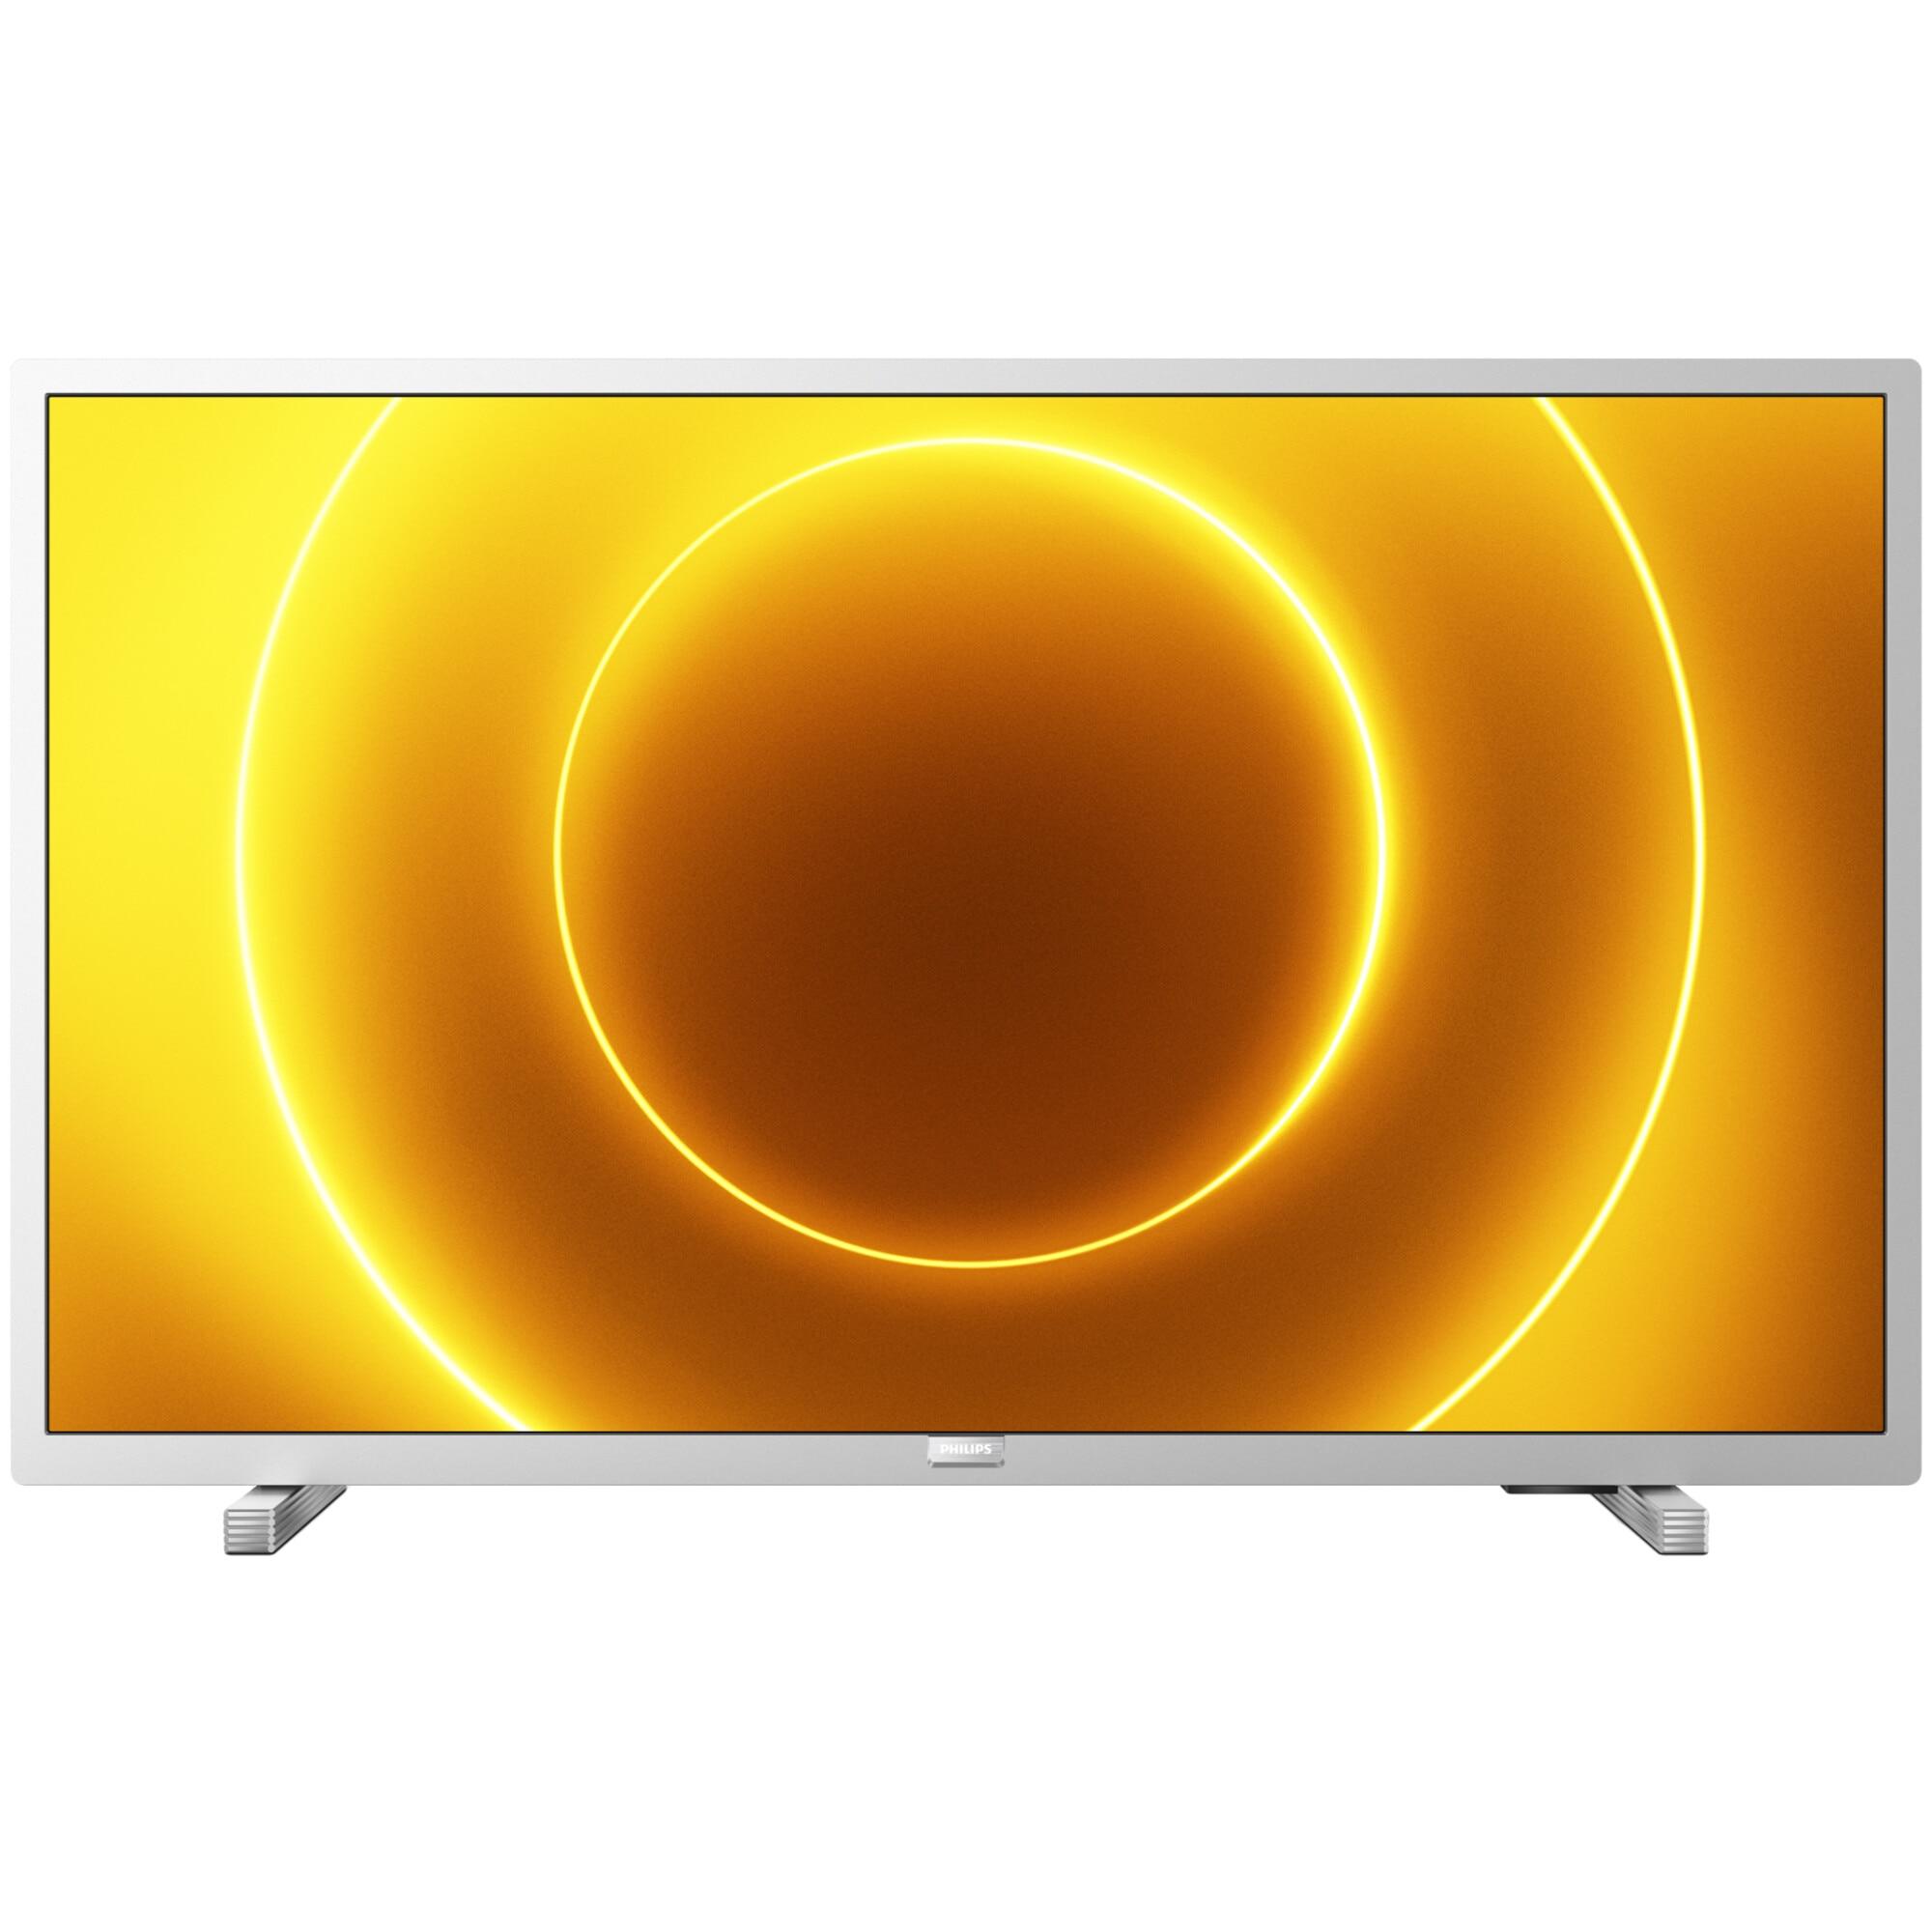 Fotografie Televizor Philips 24PFS5525/12, 60 cm, Full HD, LED, Clasa F